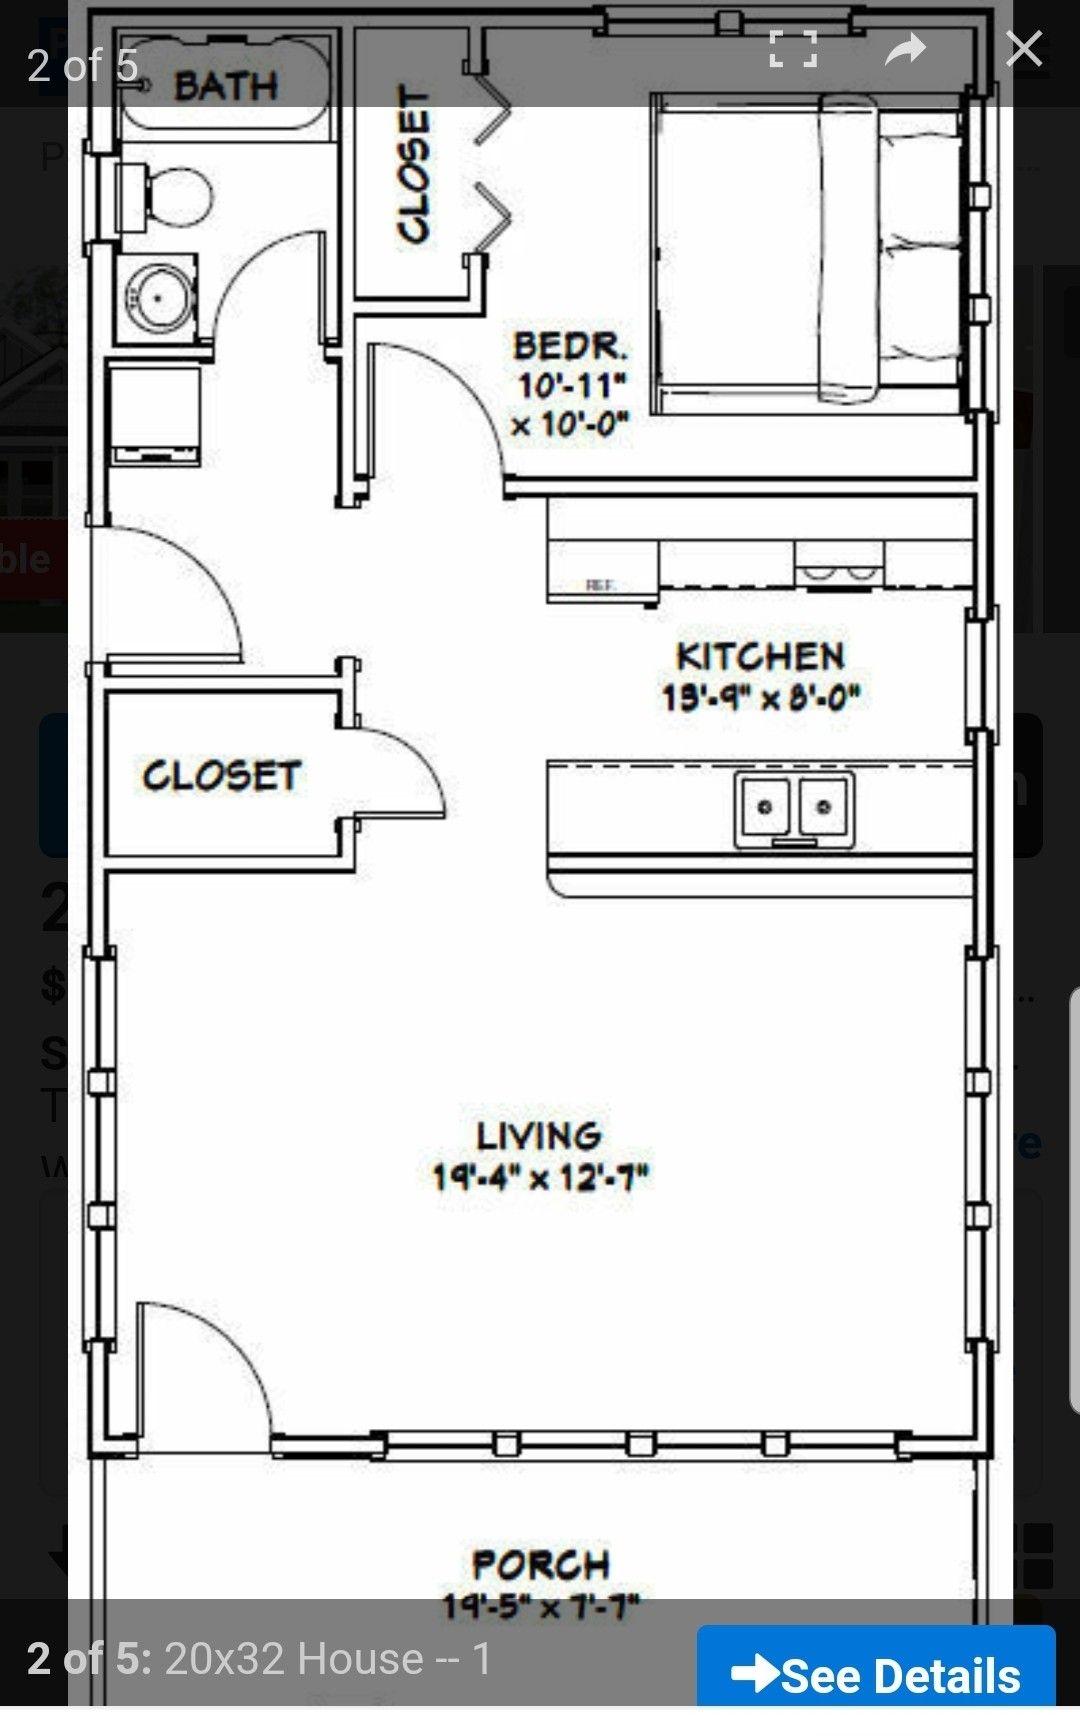 Pin by lori on Floor plan one bedroom plus loft in 2020